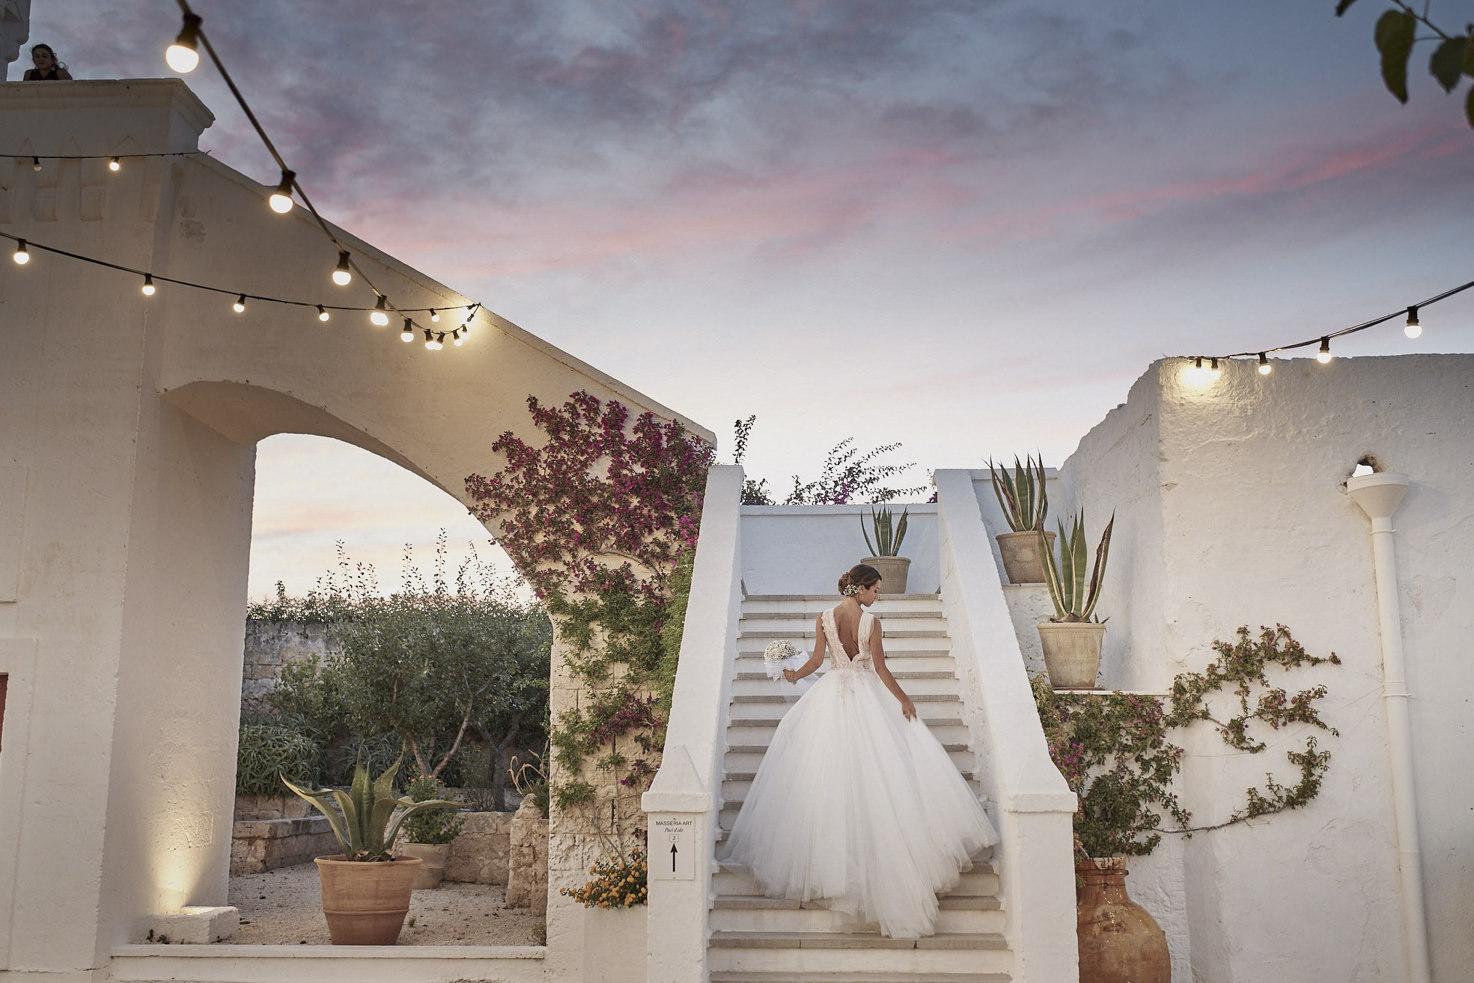 Torre Coccaro for weddings in Puglia